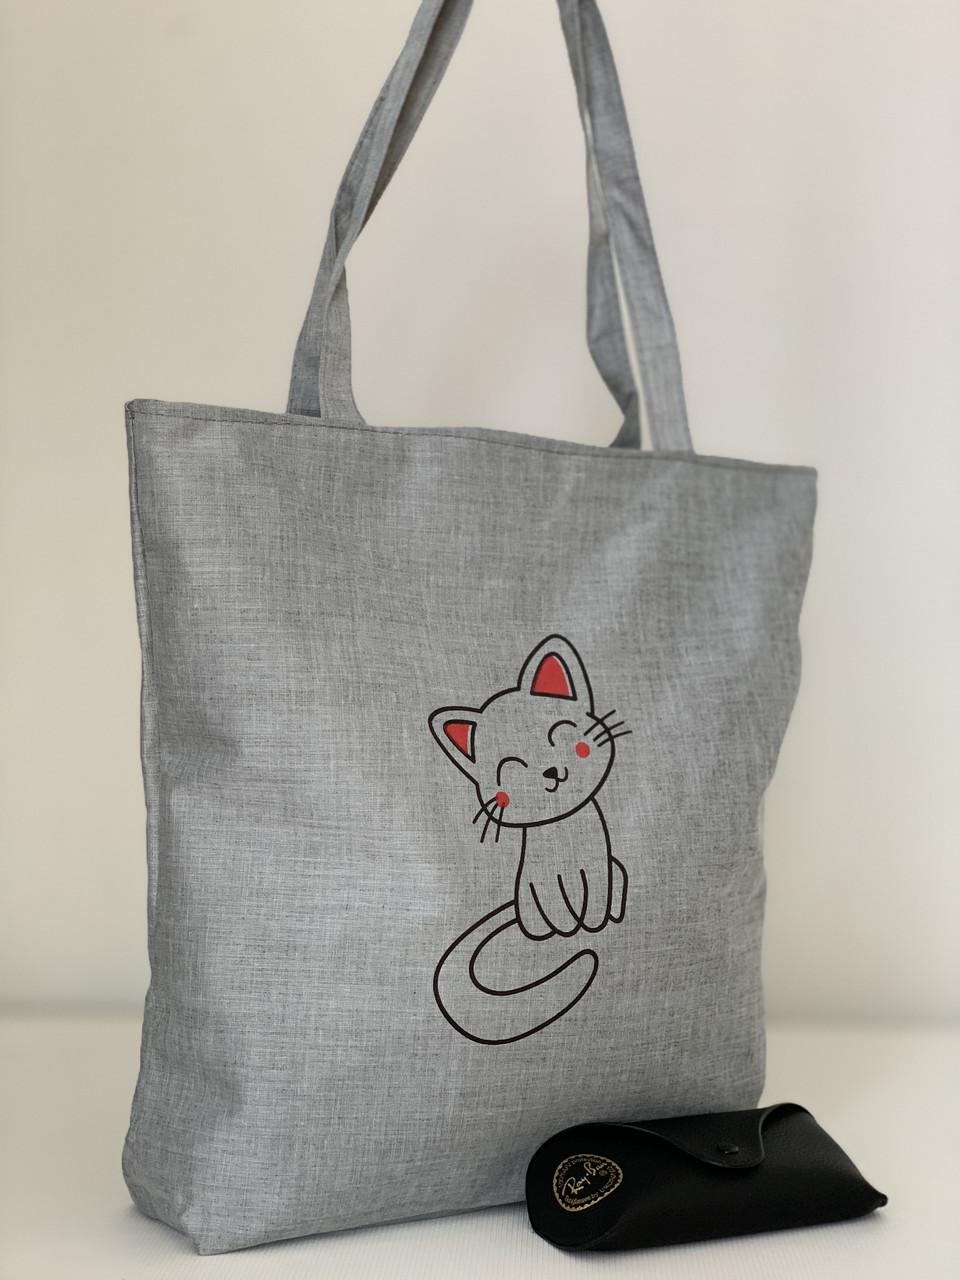 Тканинна сіра сумка шоппер з принтом котика